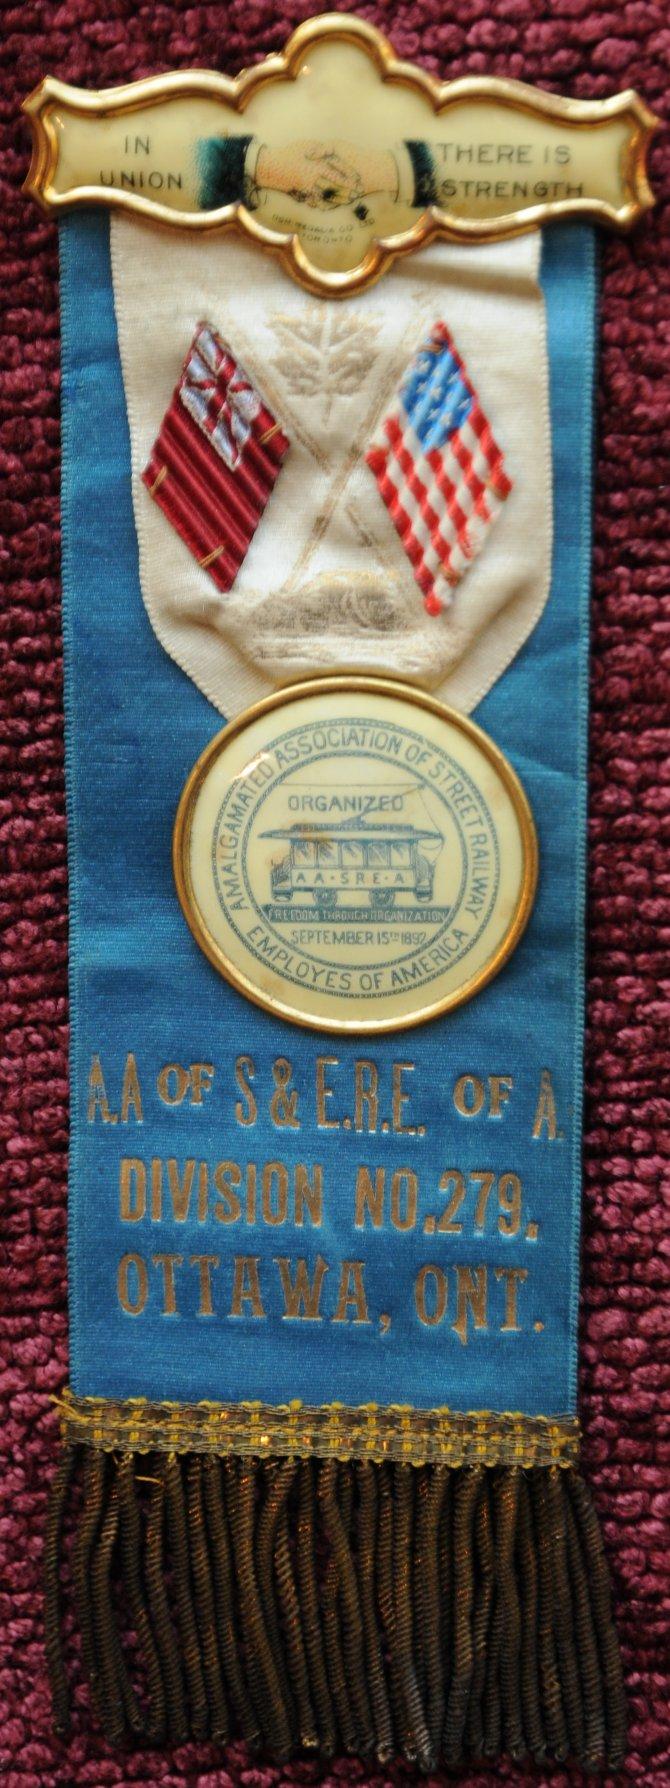 Amalgamated Association of Street Railway Employees of America, 1892